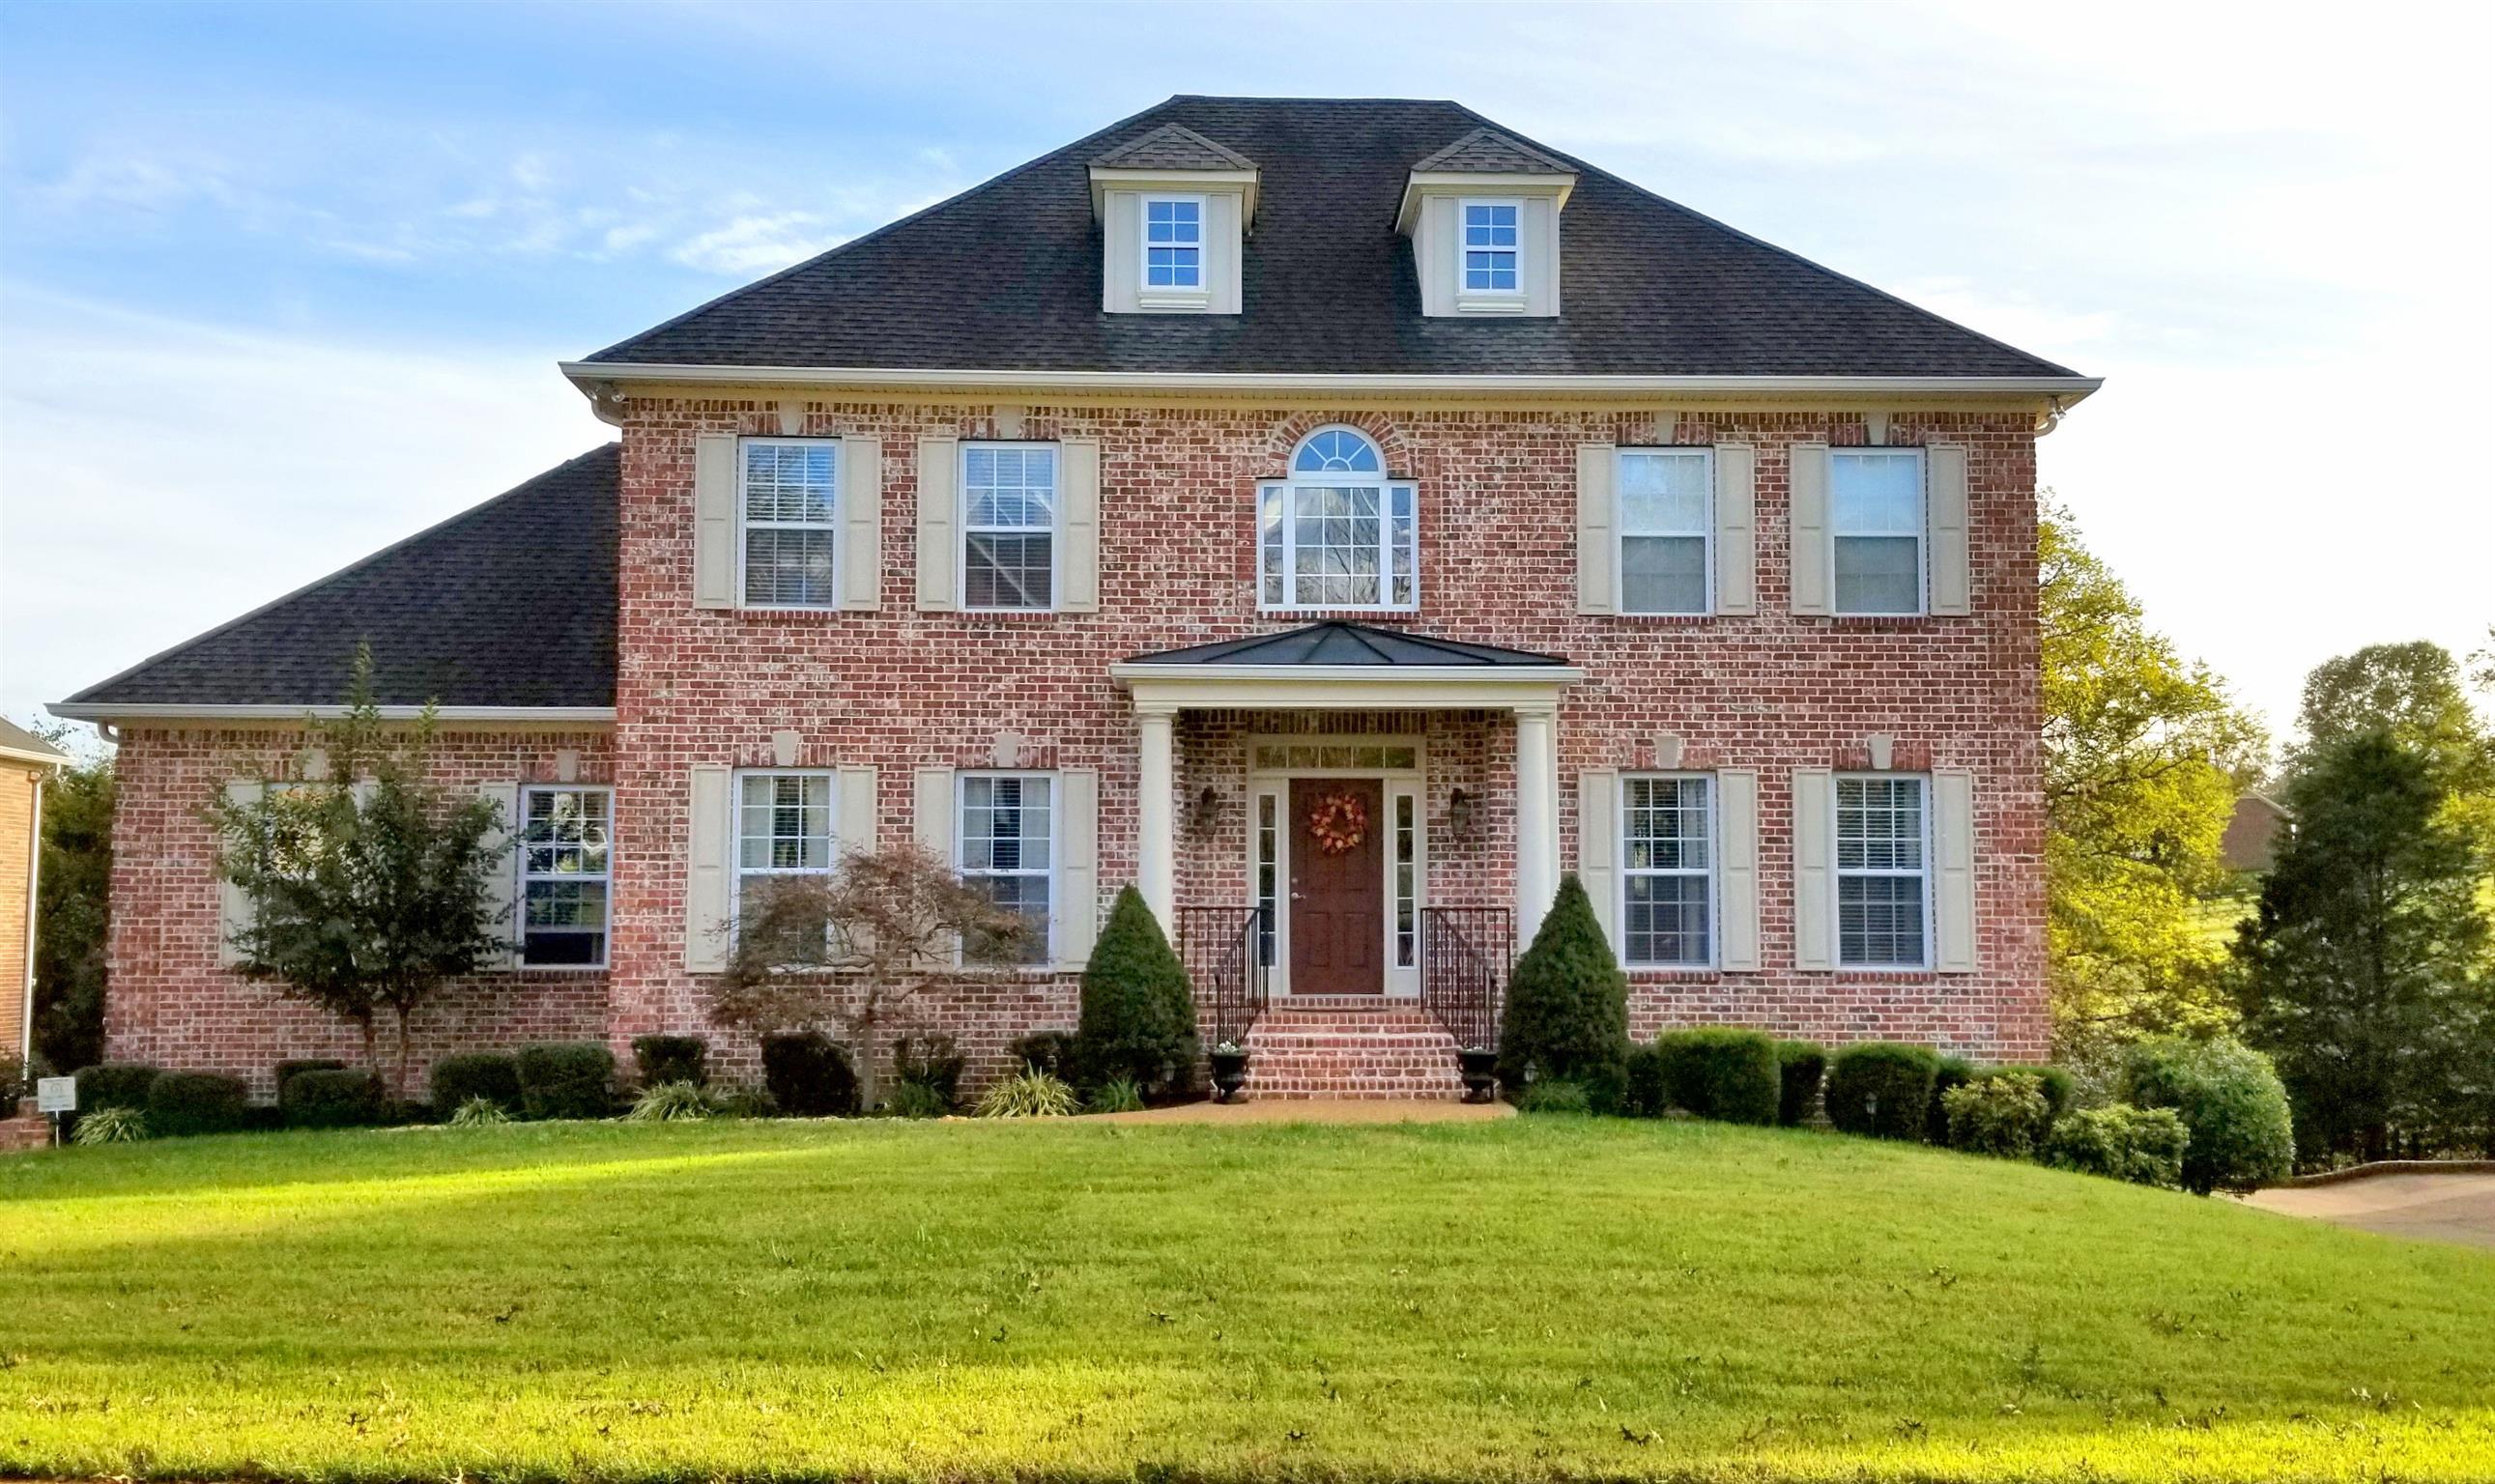 1018 Island Brook Dr, Hendersonville, TN 37075 - Hendersonville, TN real estate listing